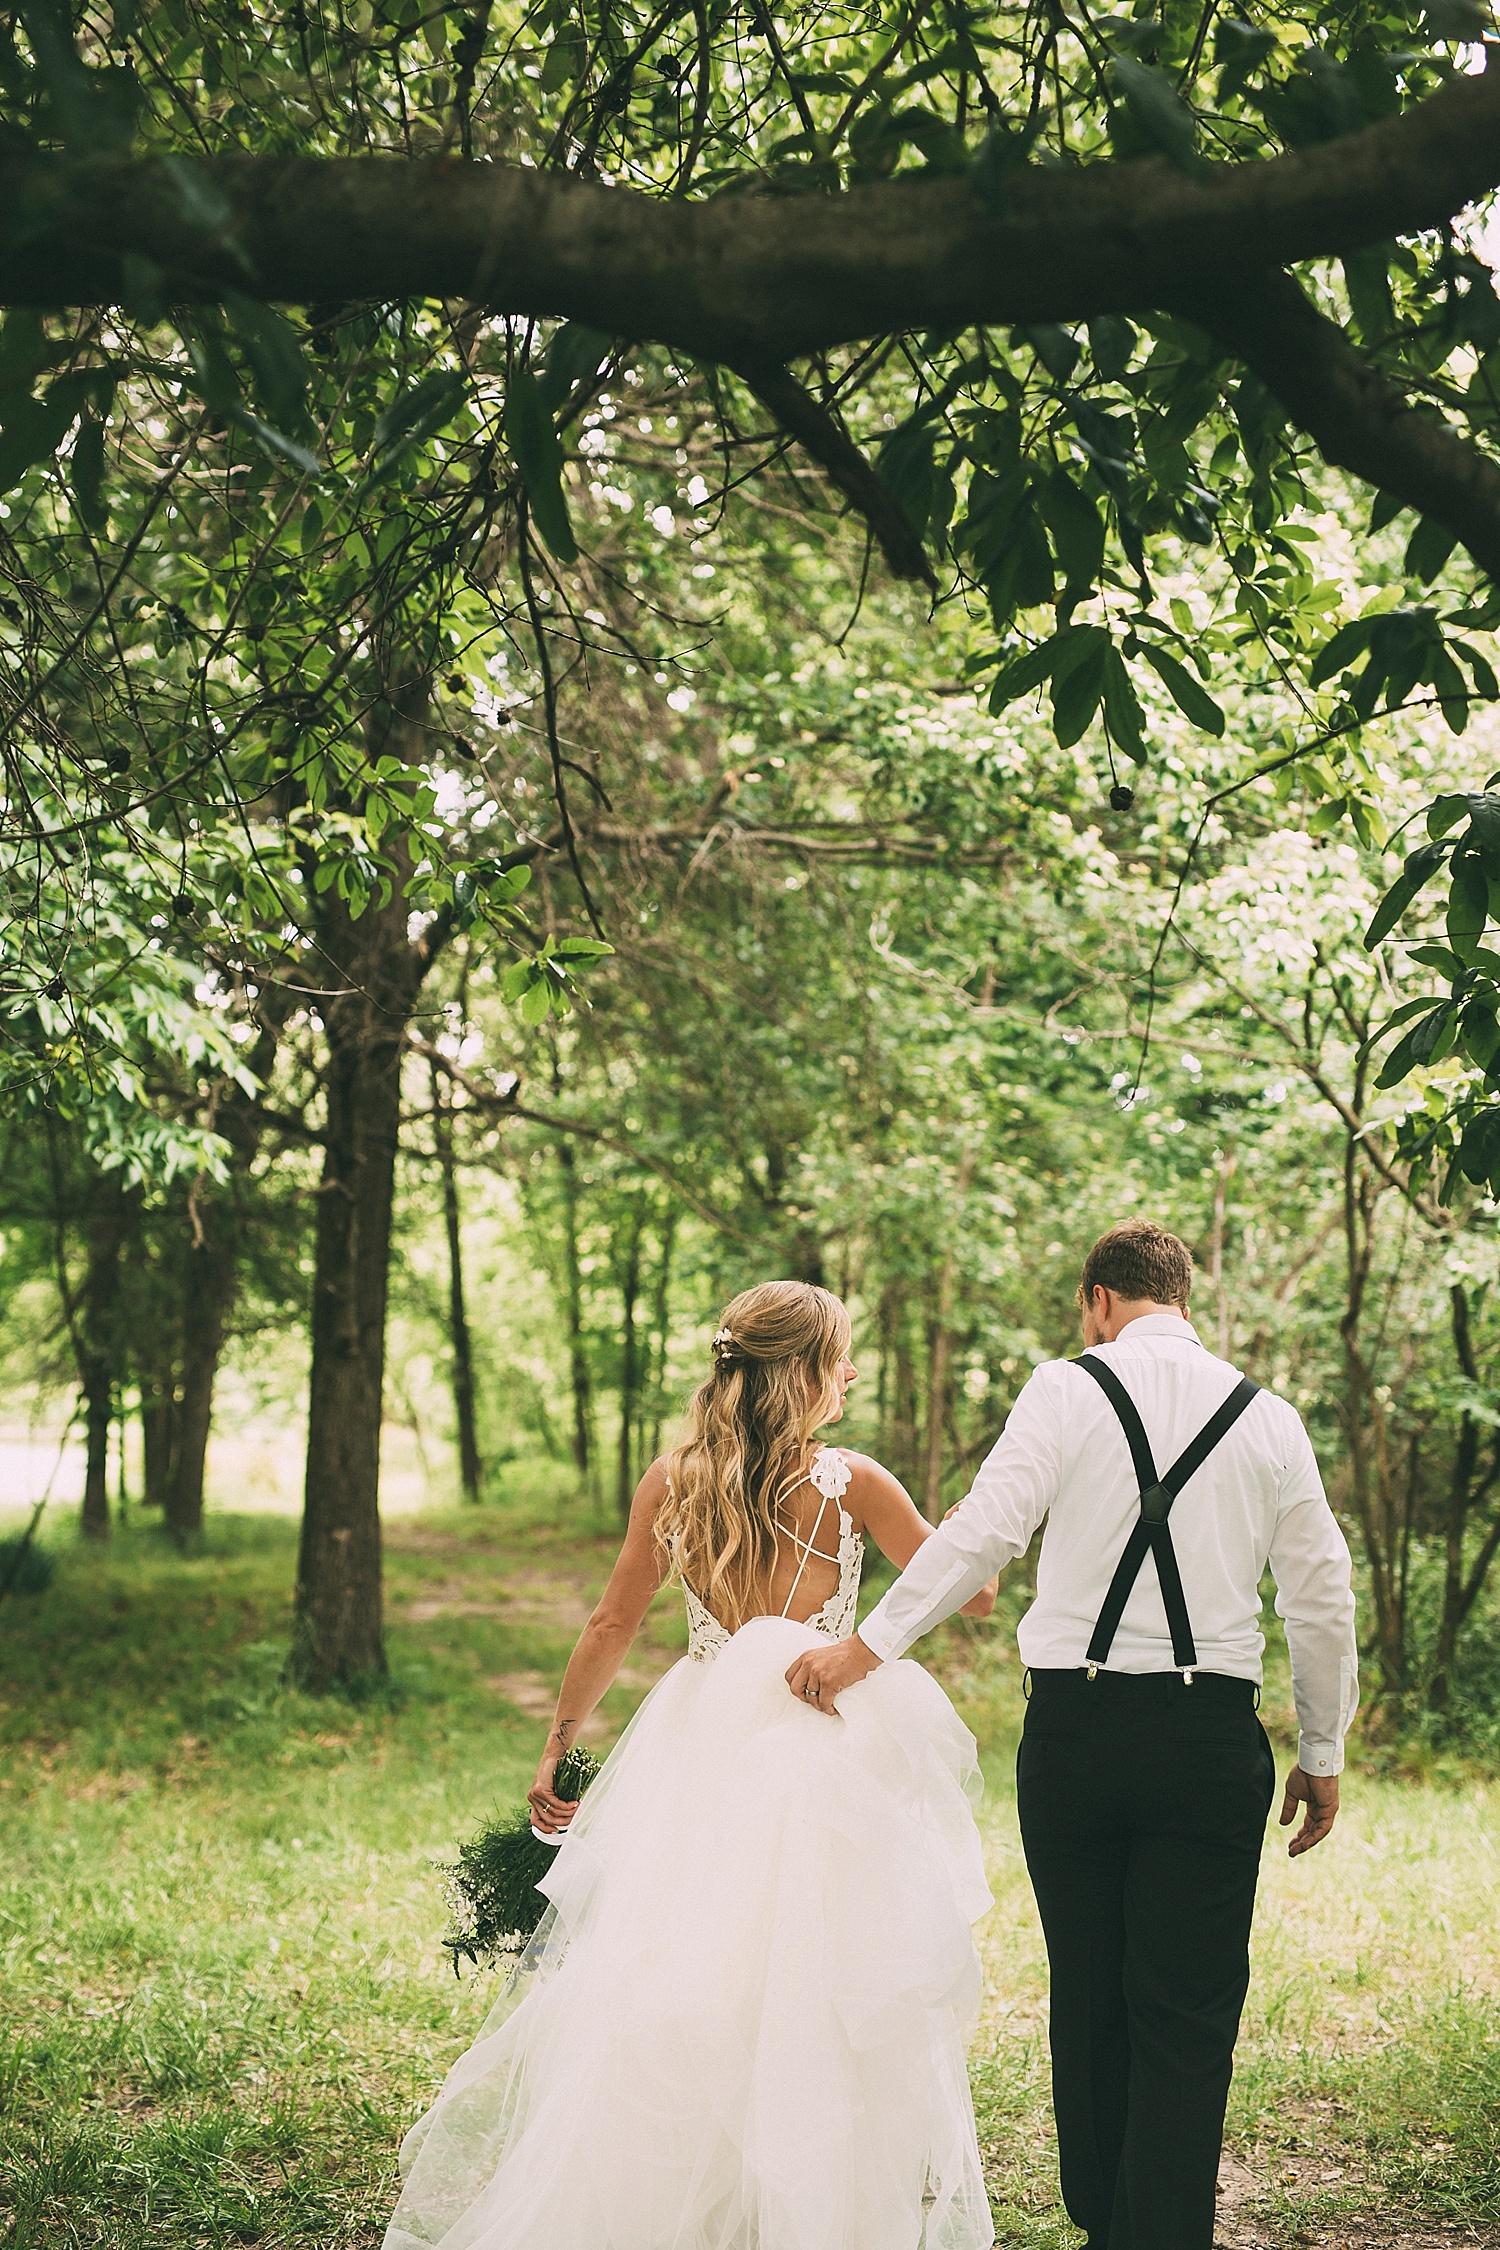 the-legacy-at-green-hills-wedding-nagel-portraits_0056.jpg